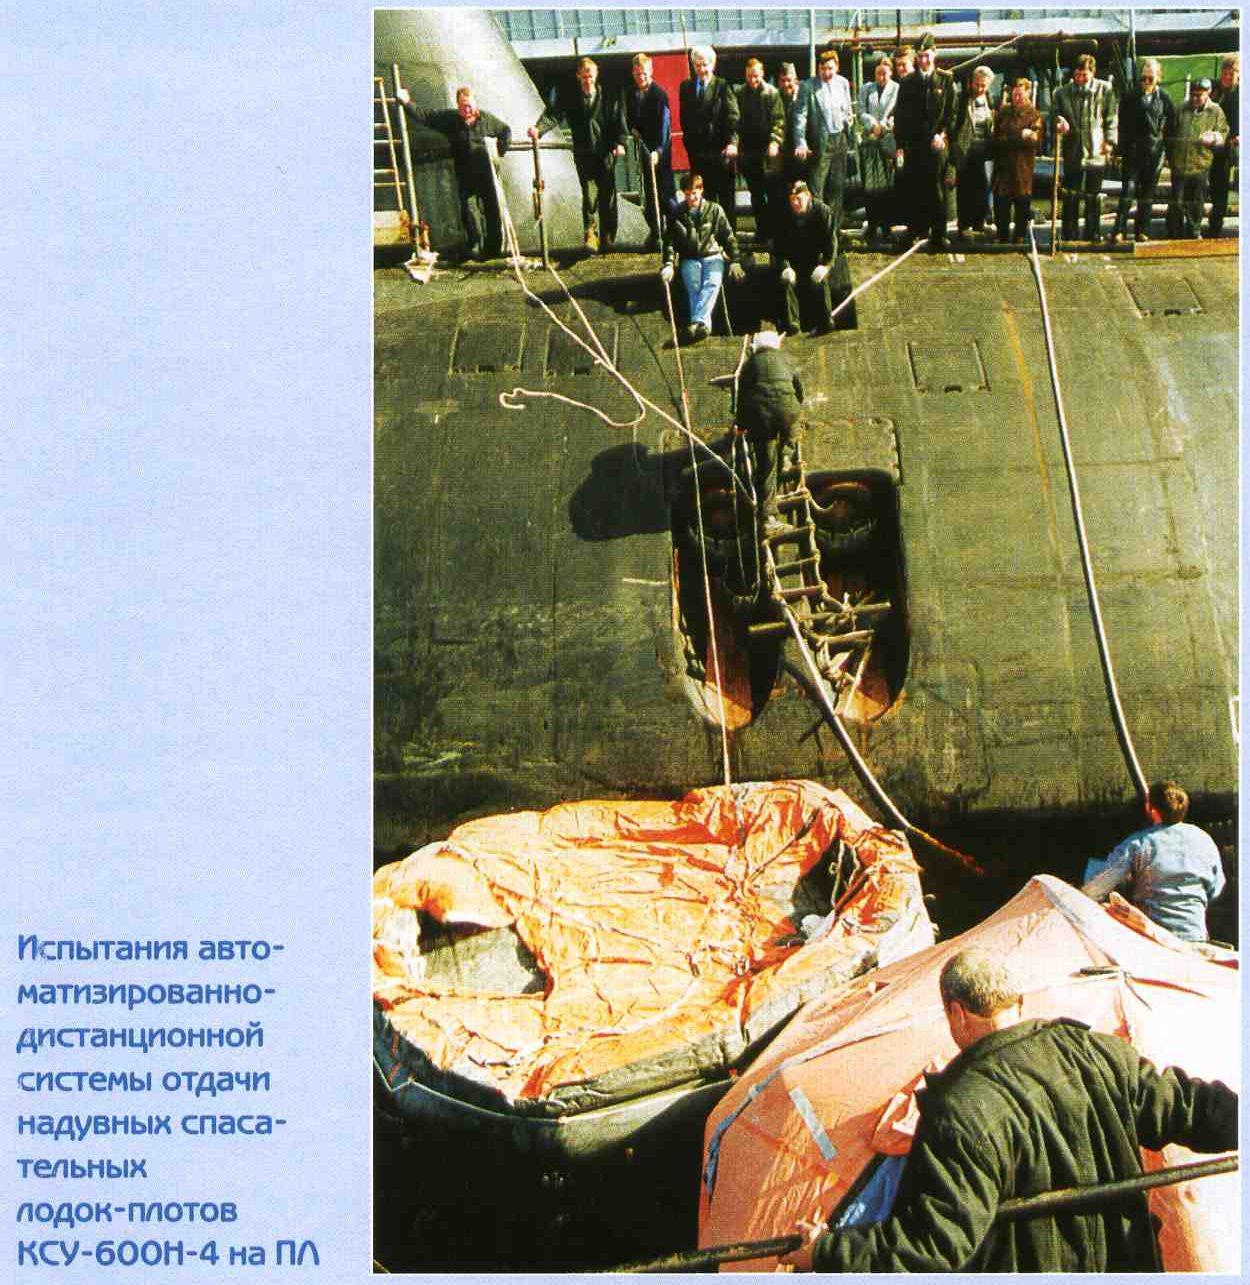 971_КСУ-600Н4.jpg